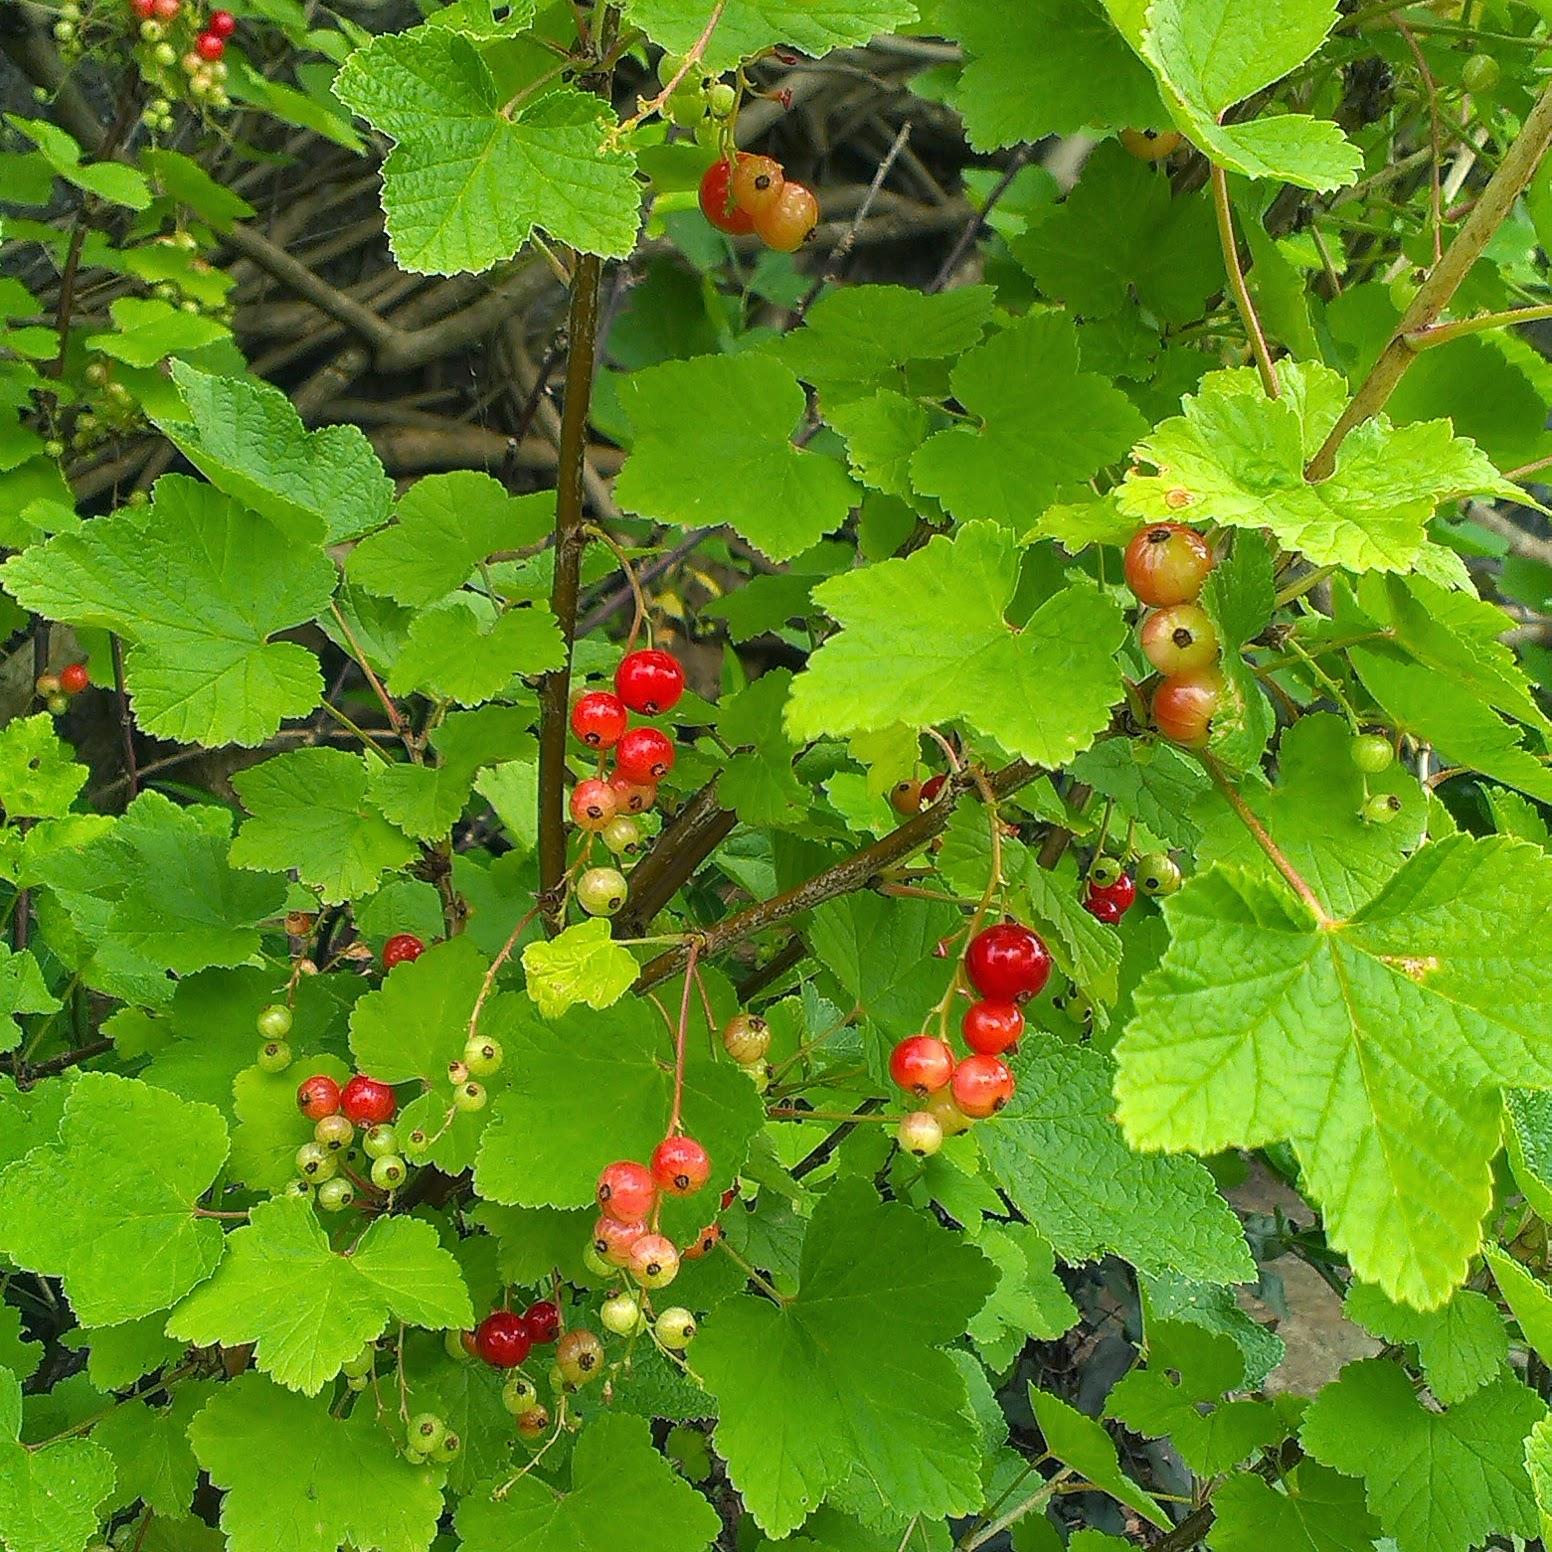 Redcurrant bush